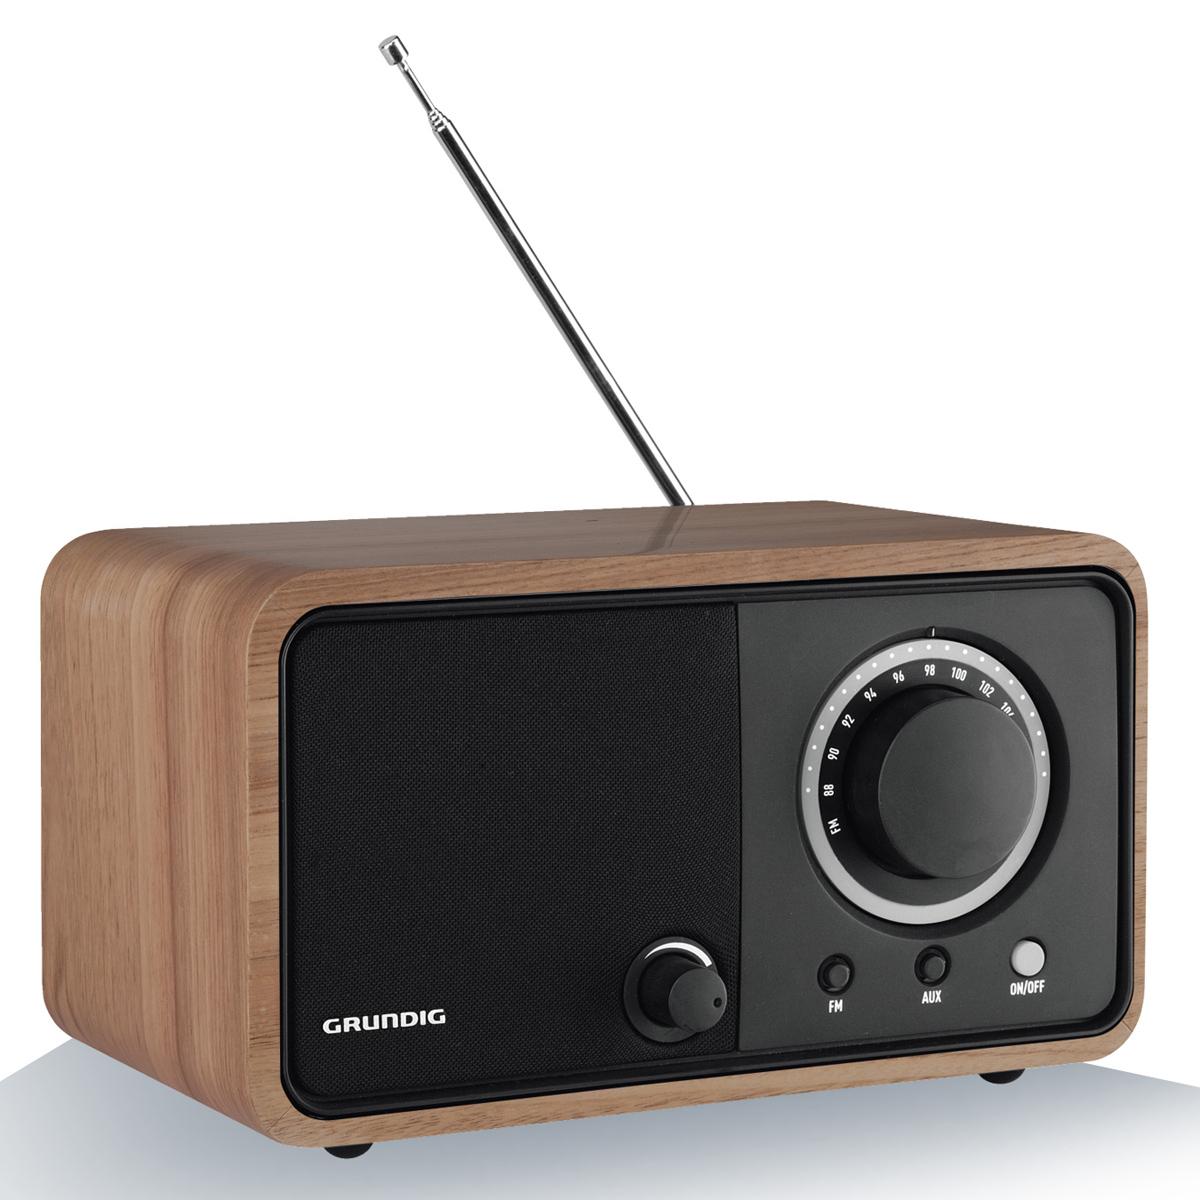 grundig tr 1200 ch ne radio radio r veil grundig sur ldlc. Black Bedroom Furniture Sets. Home Design Ideas